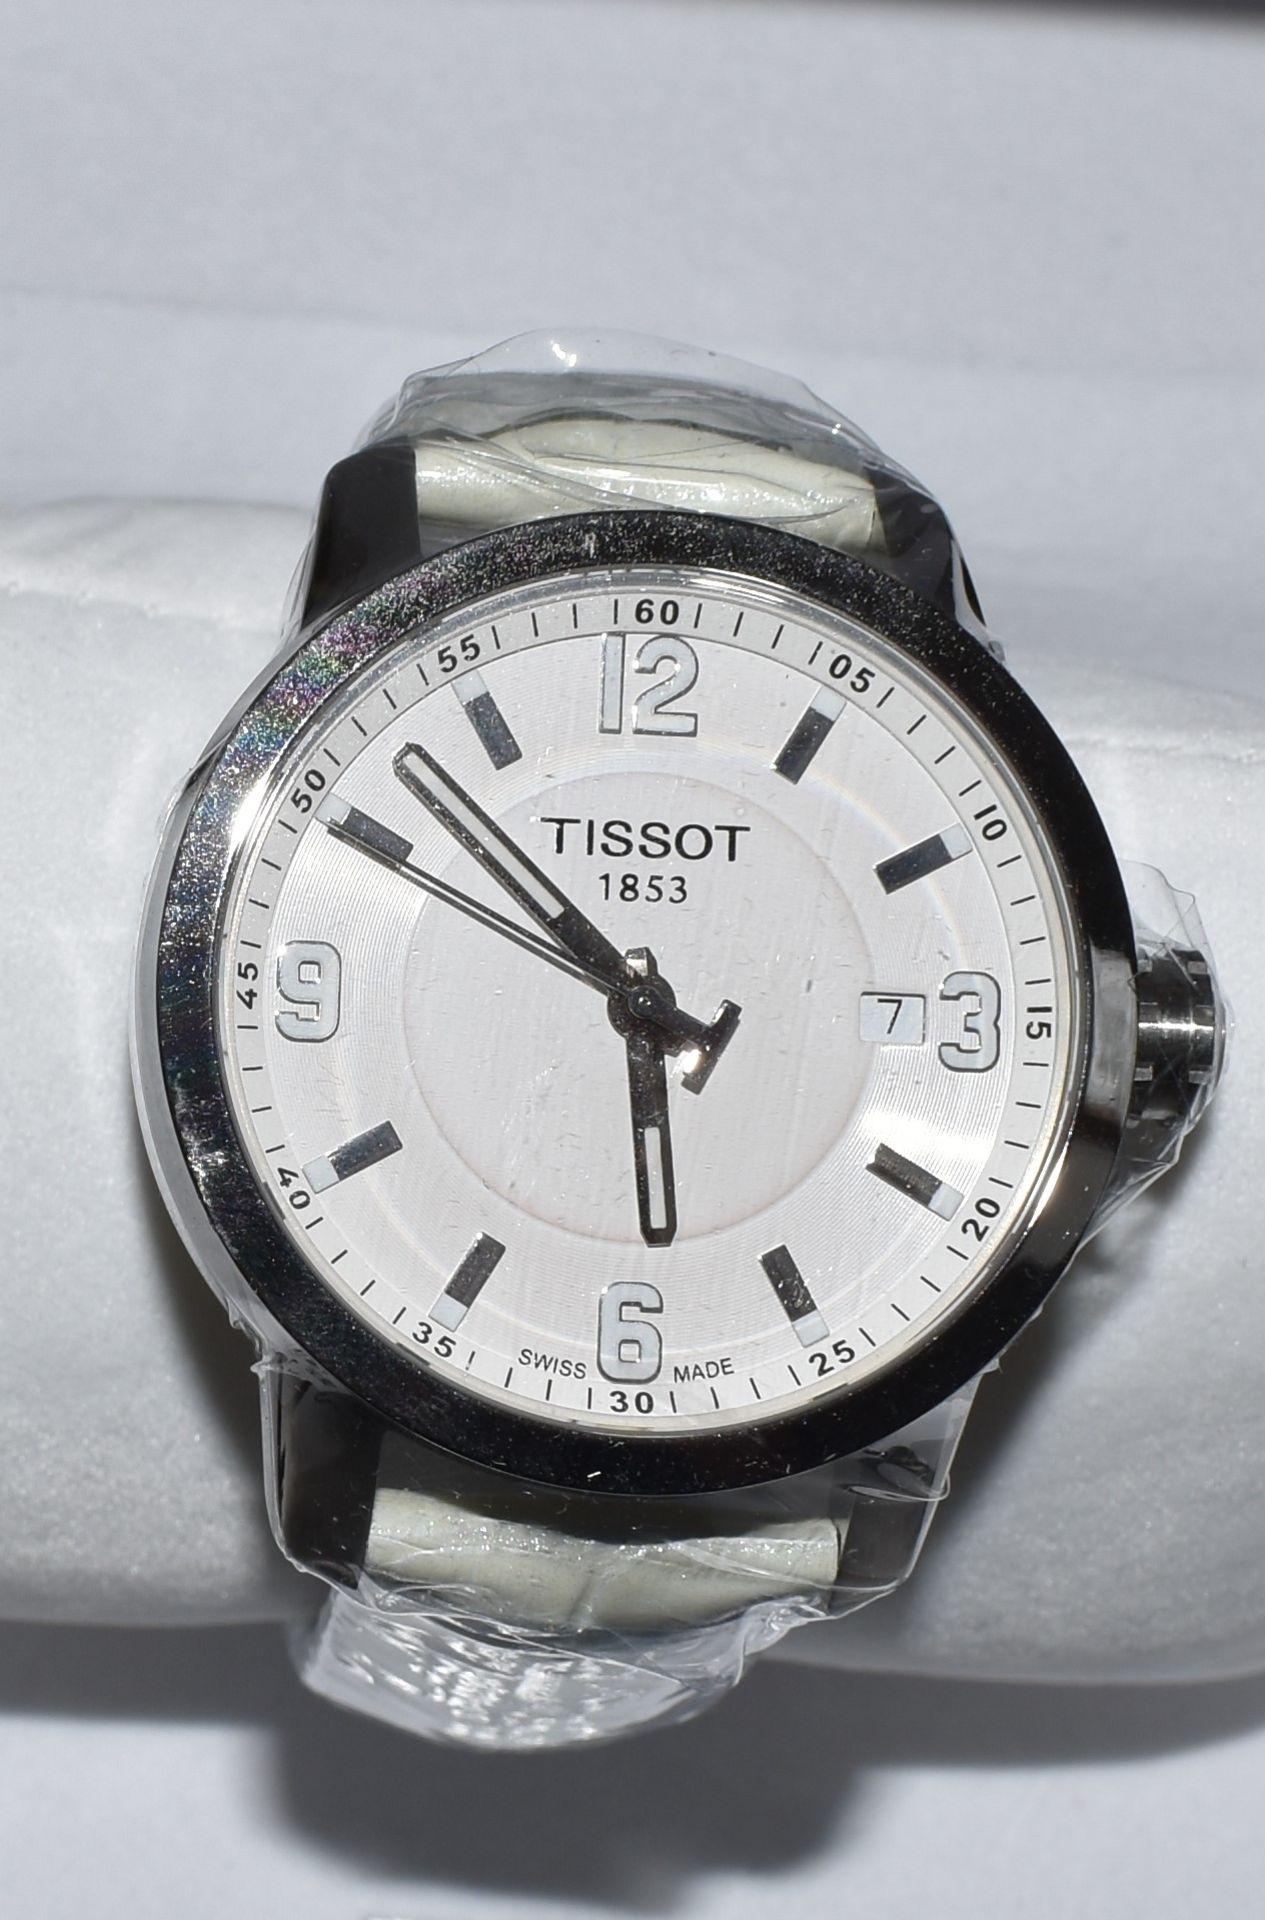 Tissot Men's Watch TO55.410.16.017.00